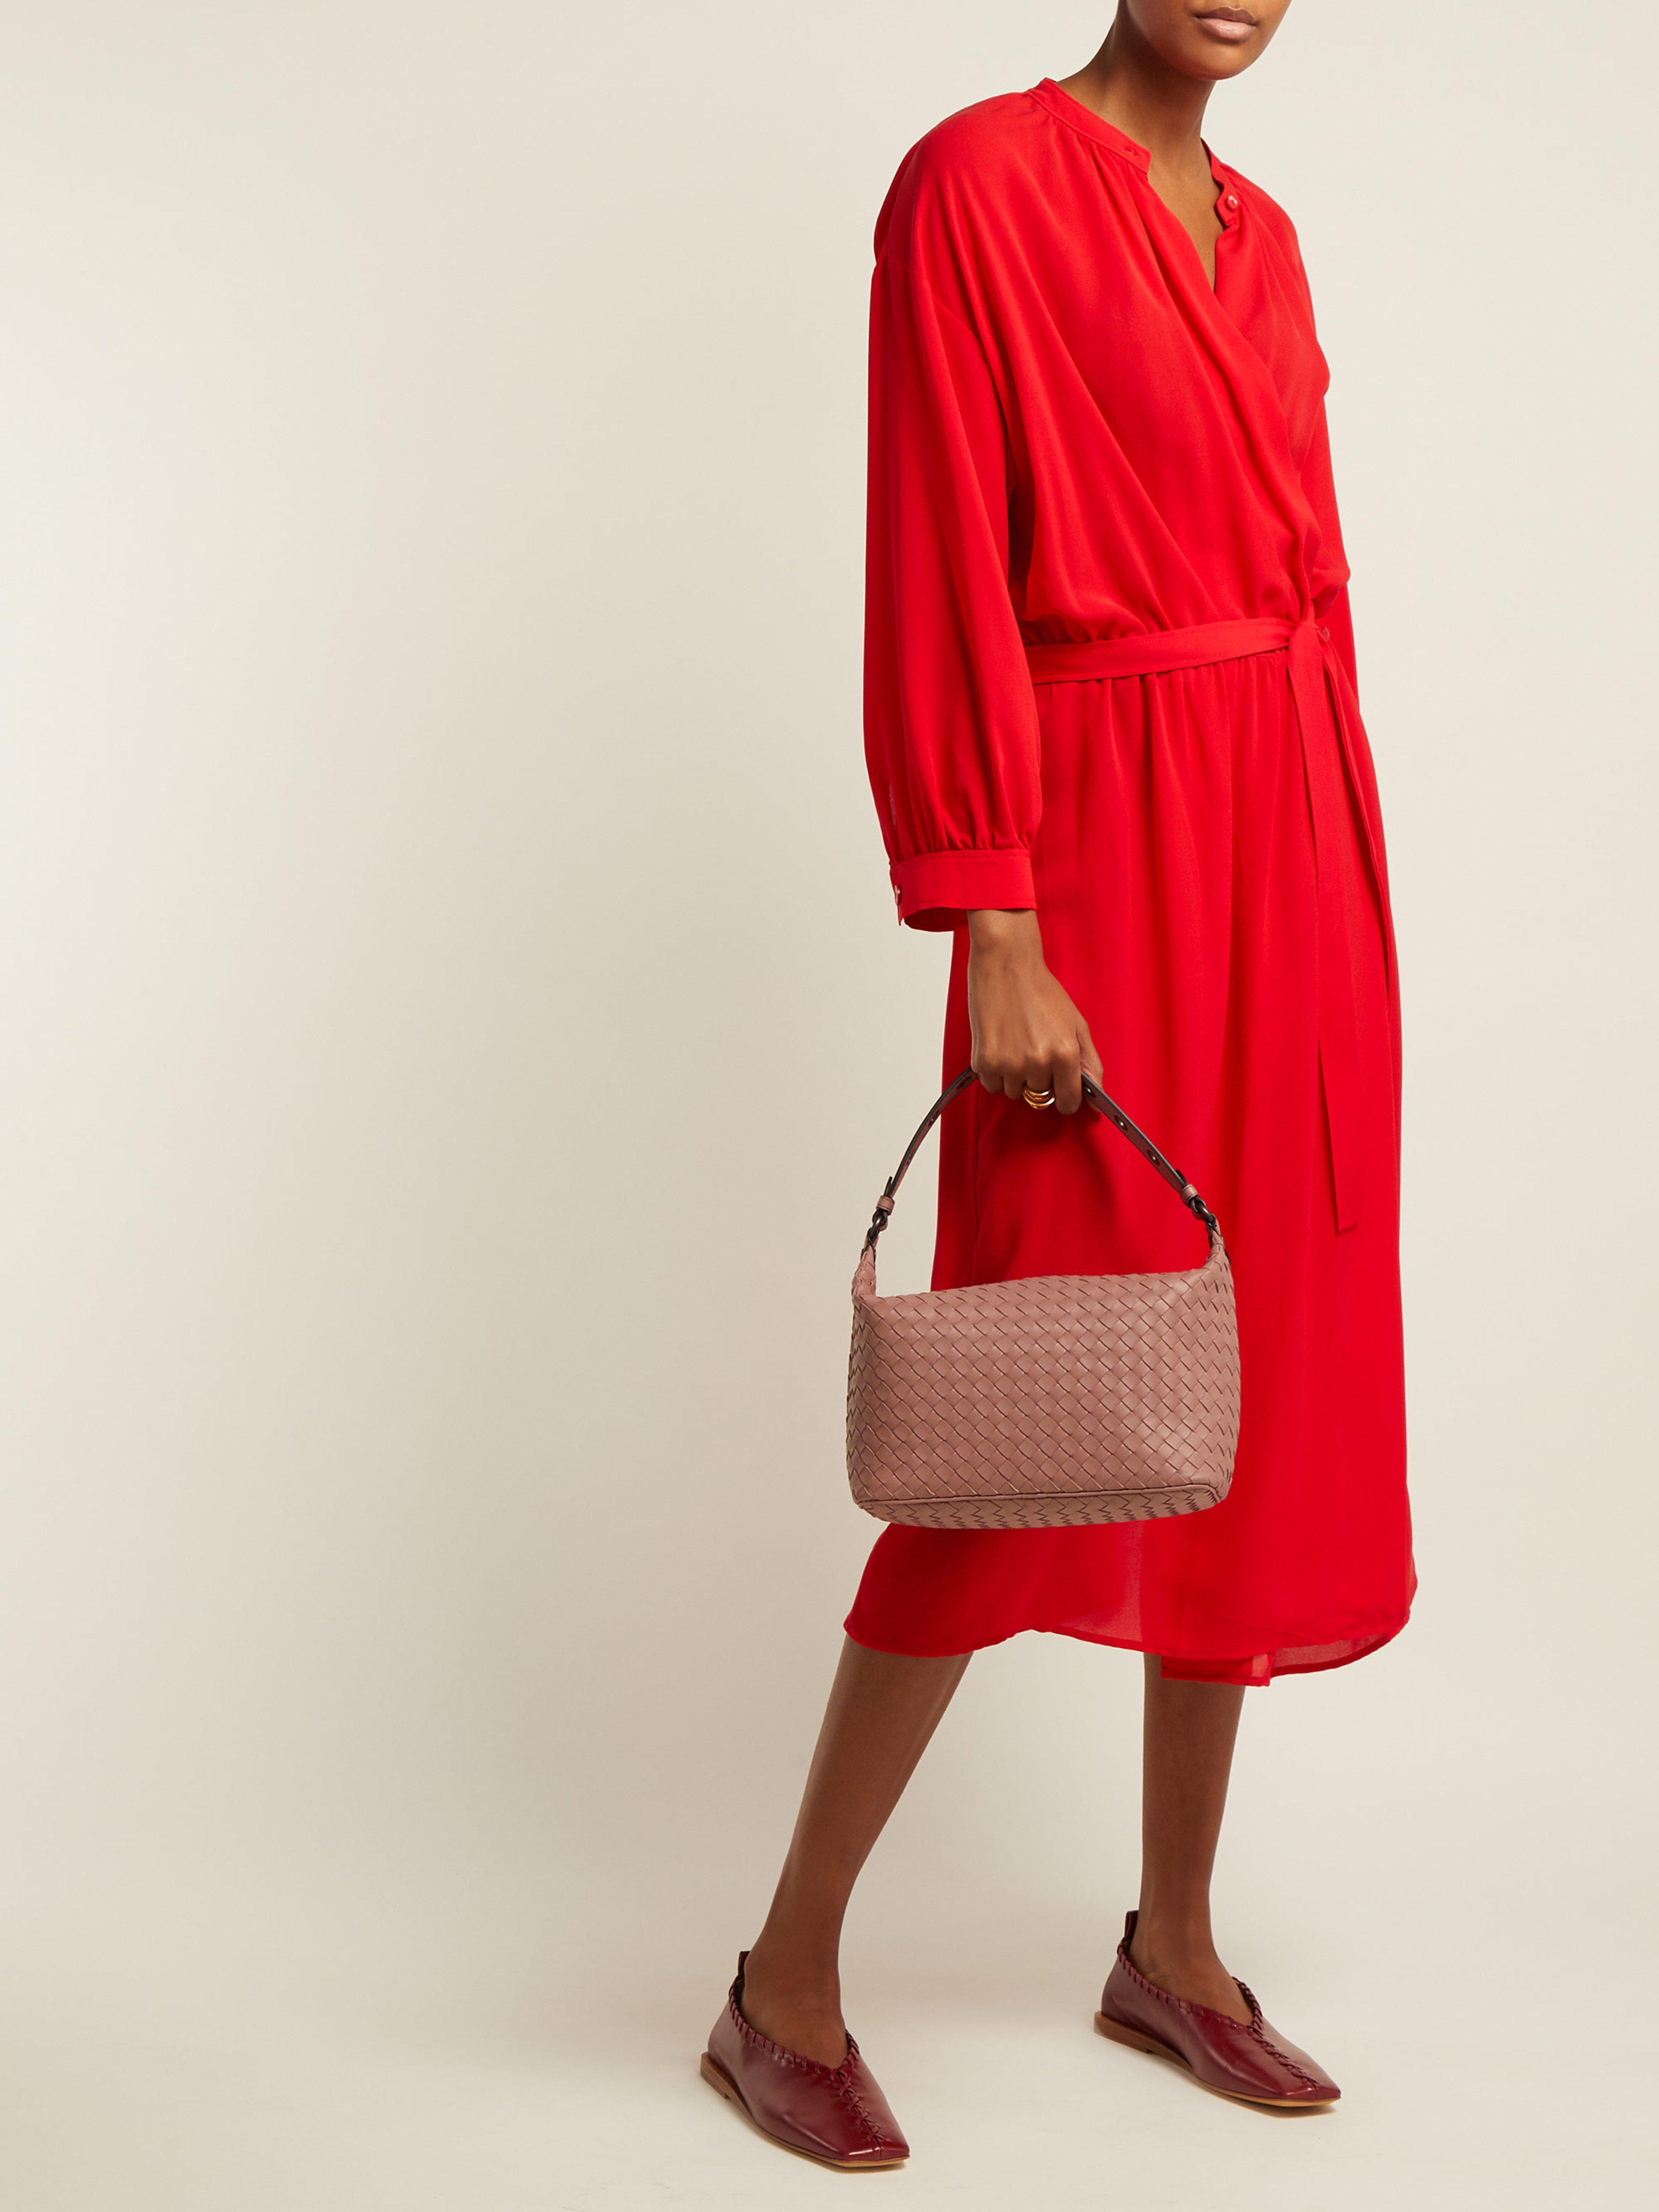 Bottega Veneta - Pink Ciambrino Intrecciato Leather Shoulder Bag - Lyst.  View fullscreen c1db00c2b96d2